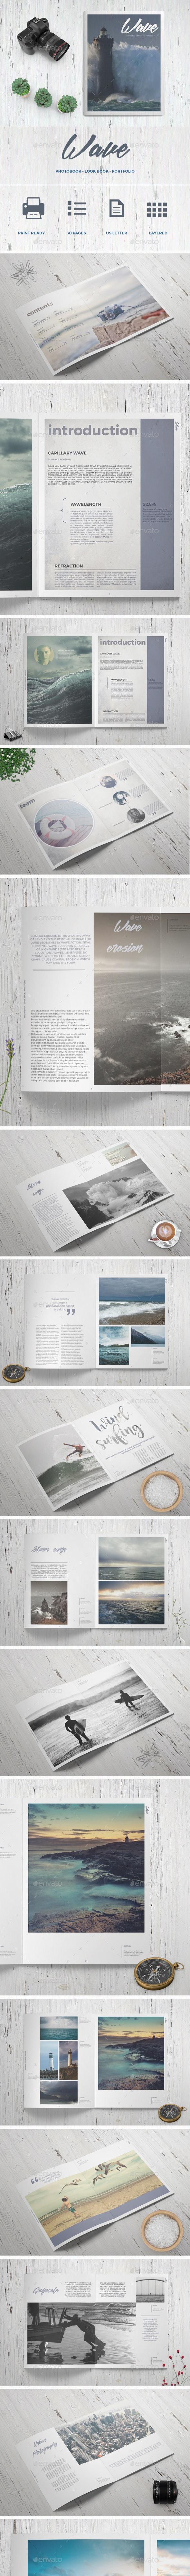 Wave - Photo Book - Photo Albums Print Templates